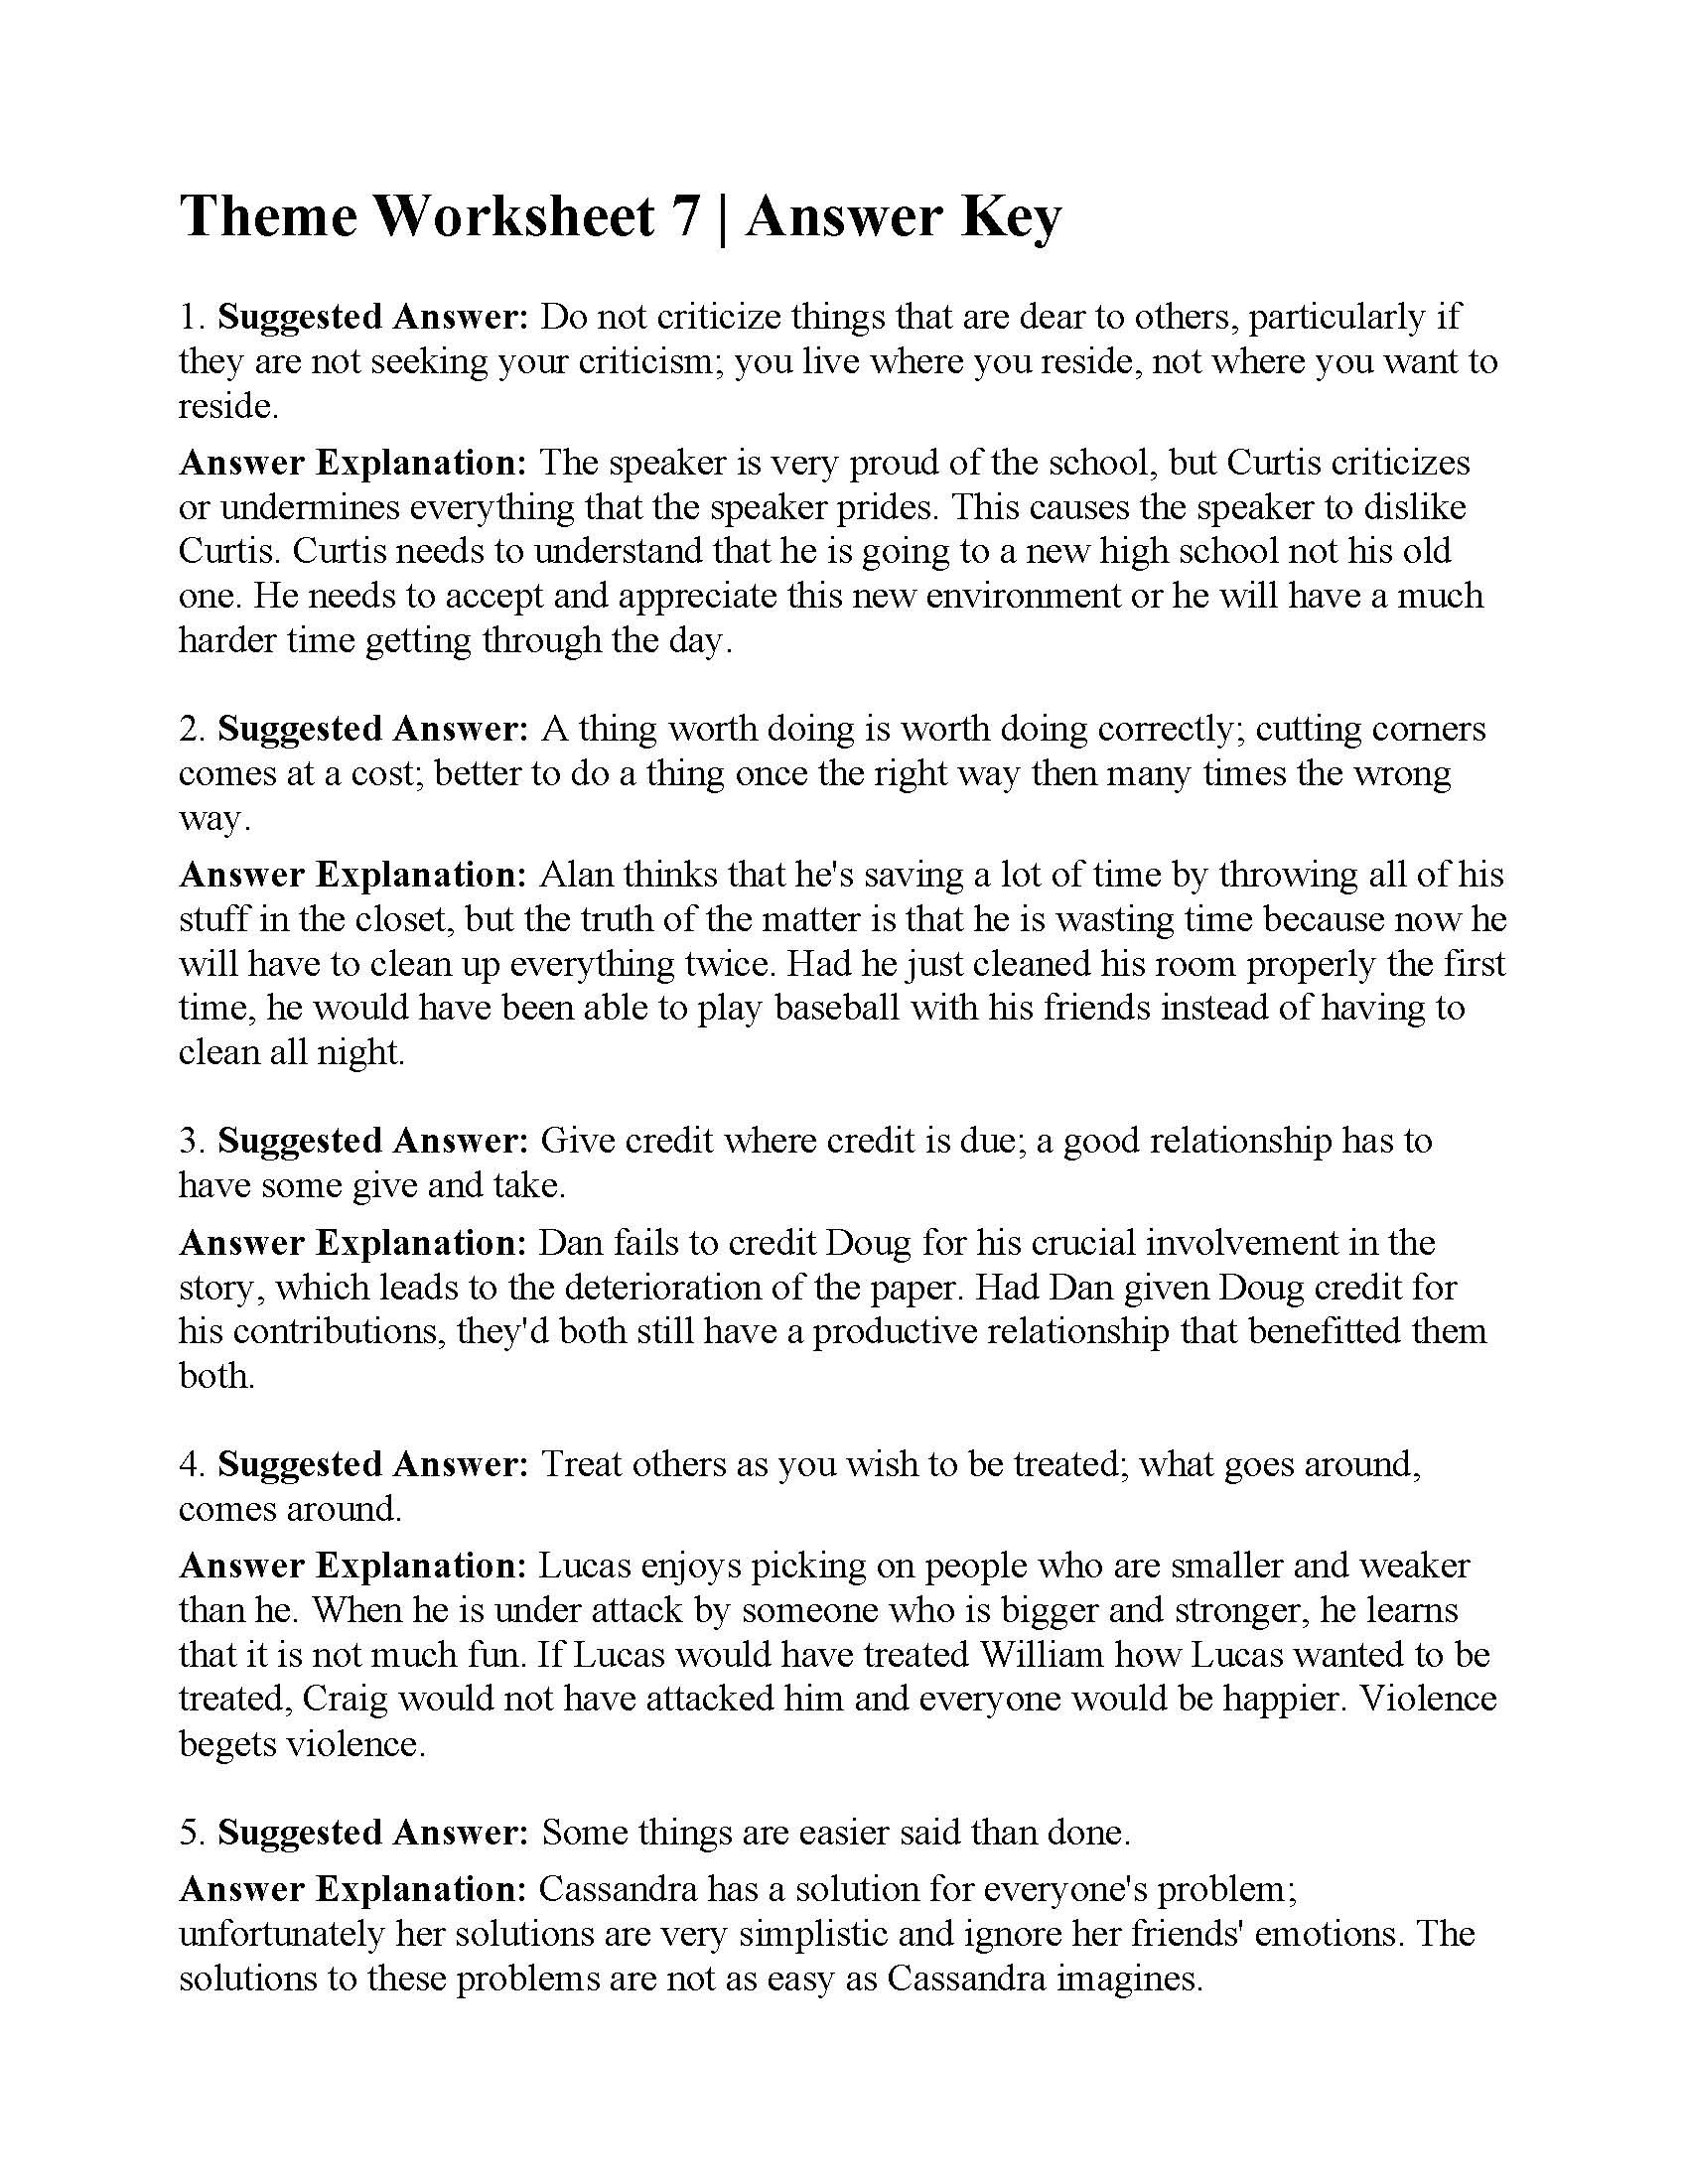 Theme Worksheets 5th Grade theme Worksheet 7